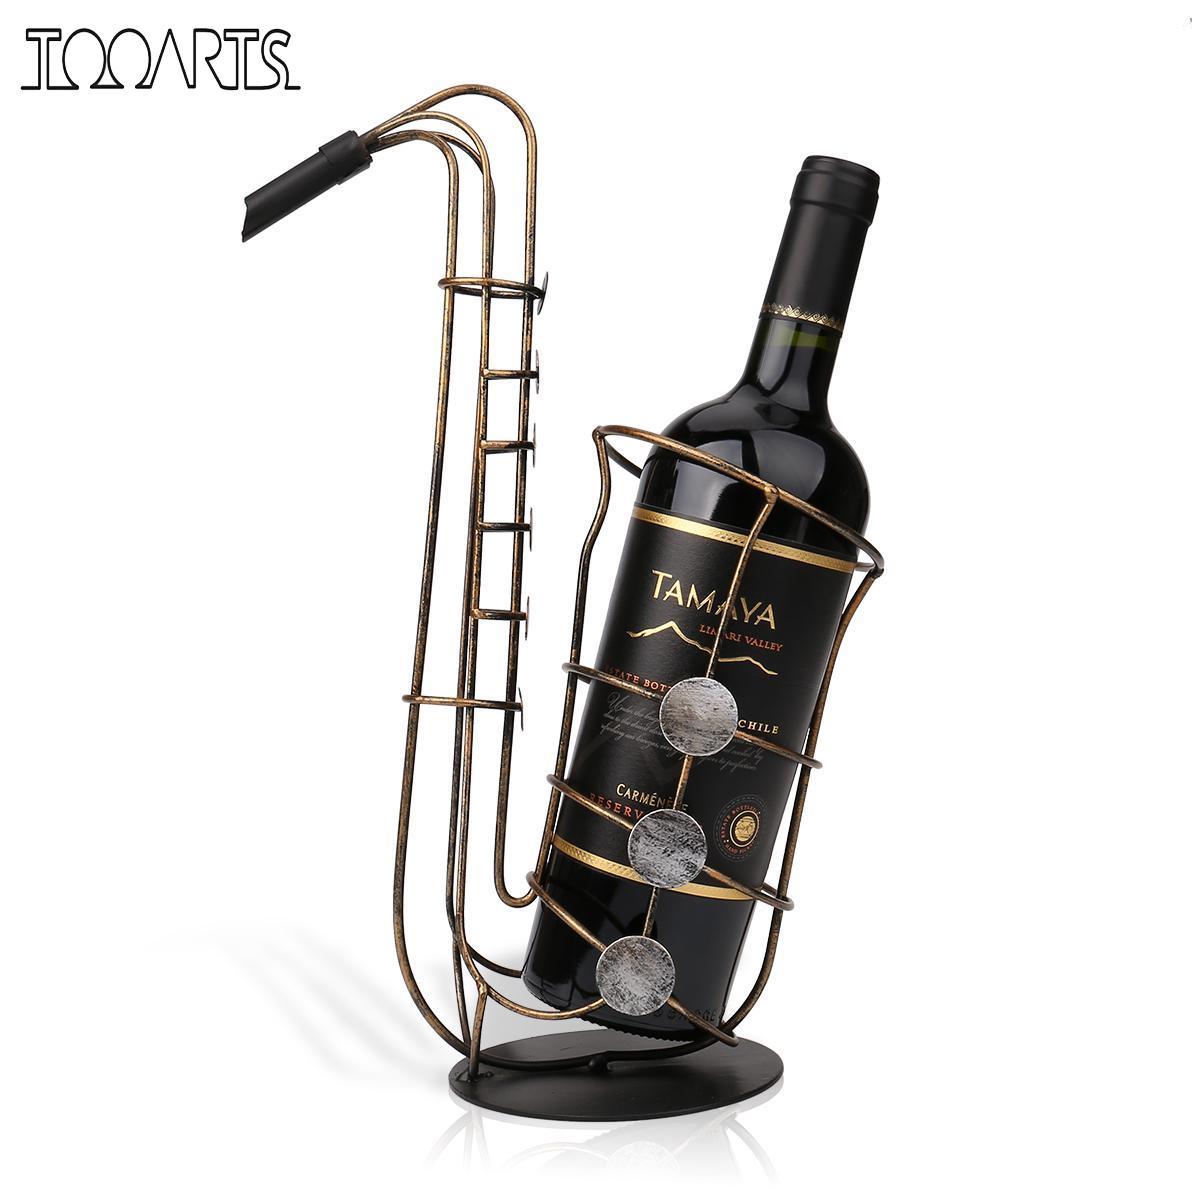 Tooarts Wine Bottle Holder Metal Figurine Sax Wine Rack Practical Figurine Crafts Artwork For Home Decoration Accessories